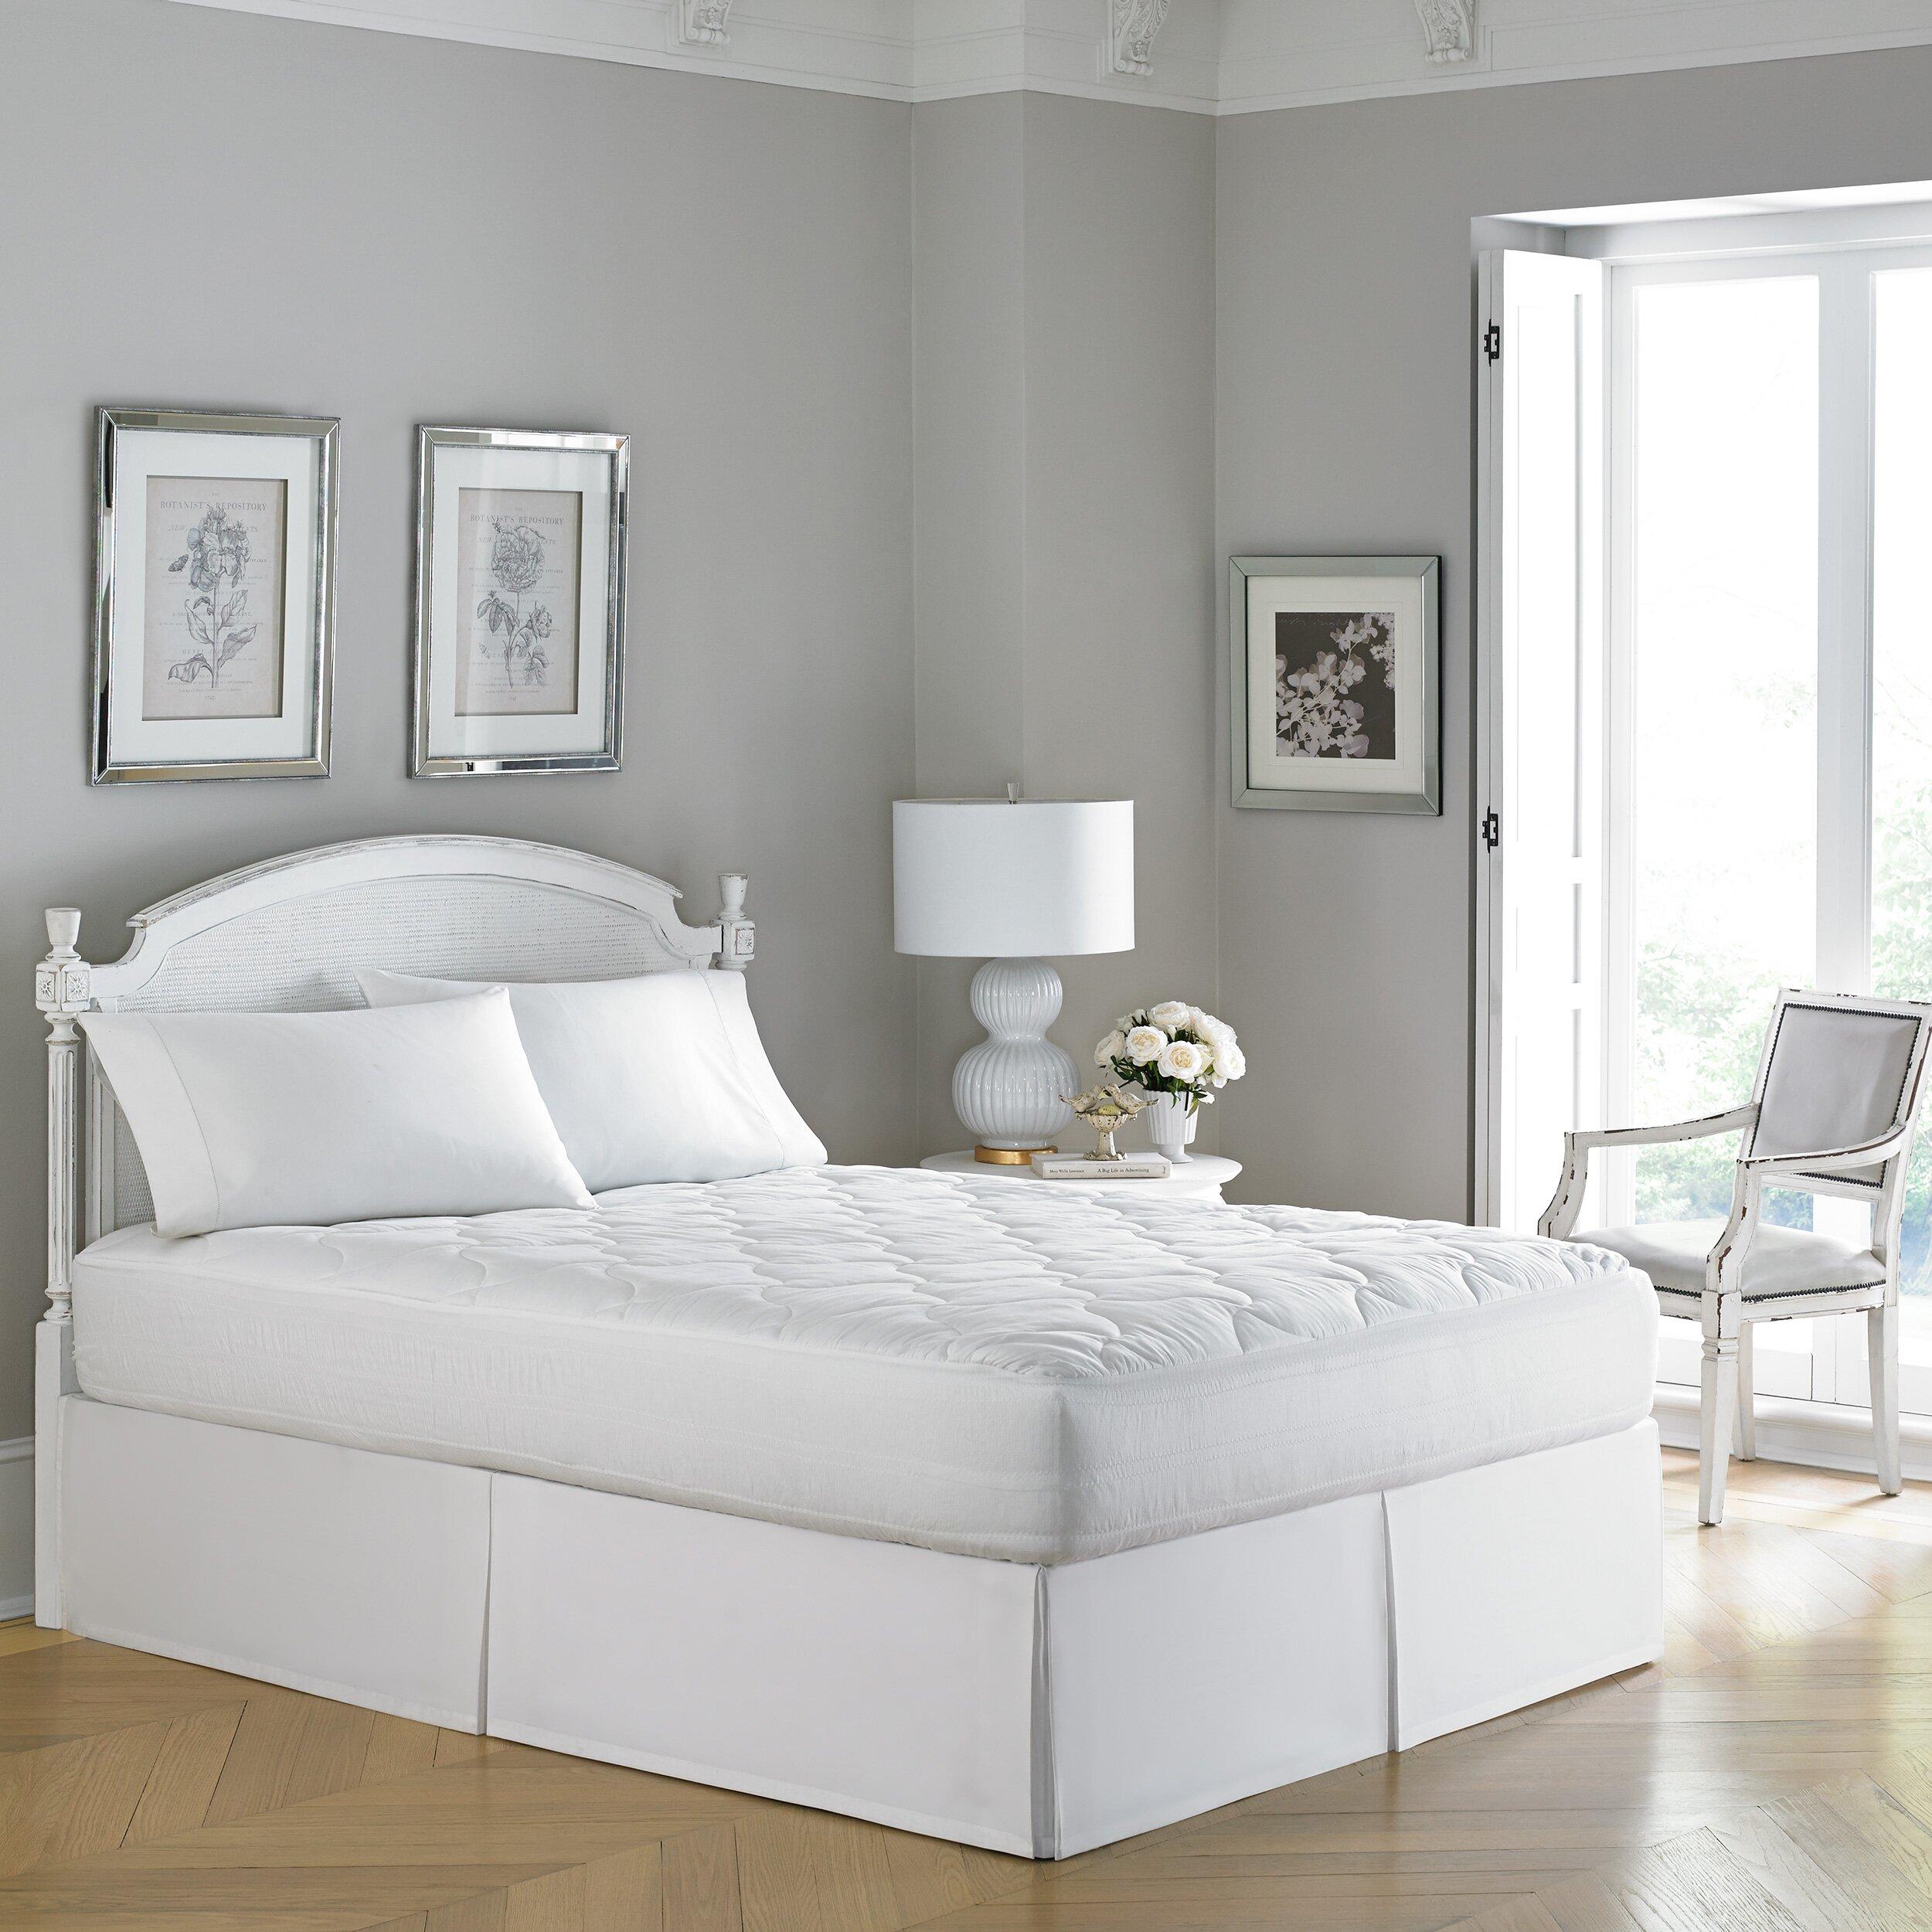 Laura Ashley Bedroom Laura Ashley Home 300 Thread Count Mattress Pad Reviews Wayfair